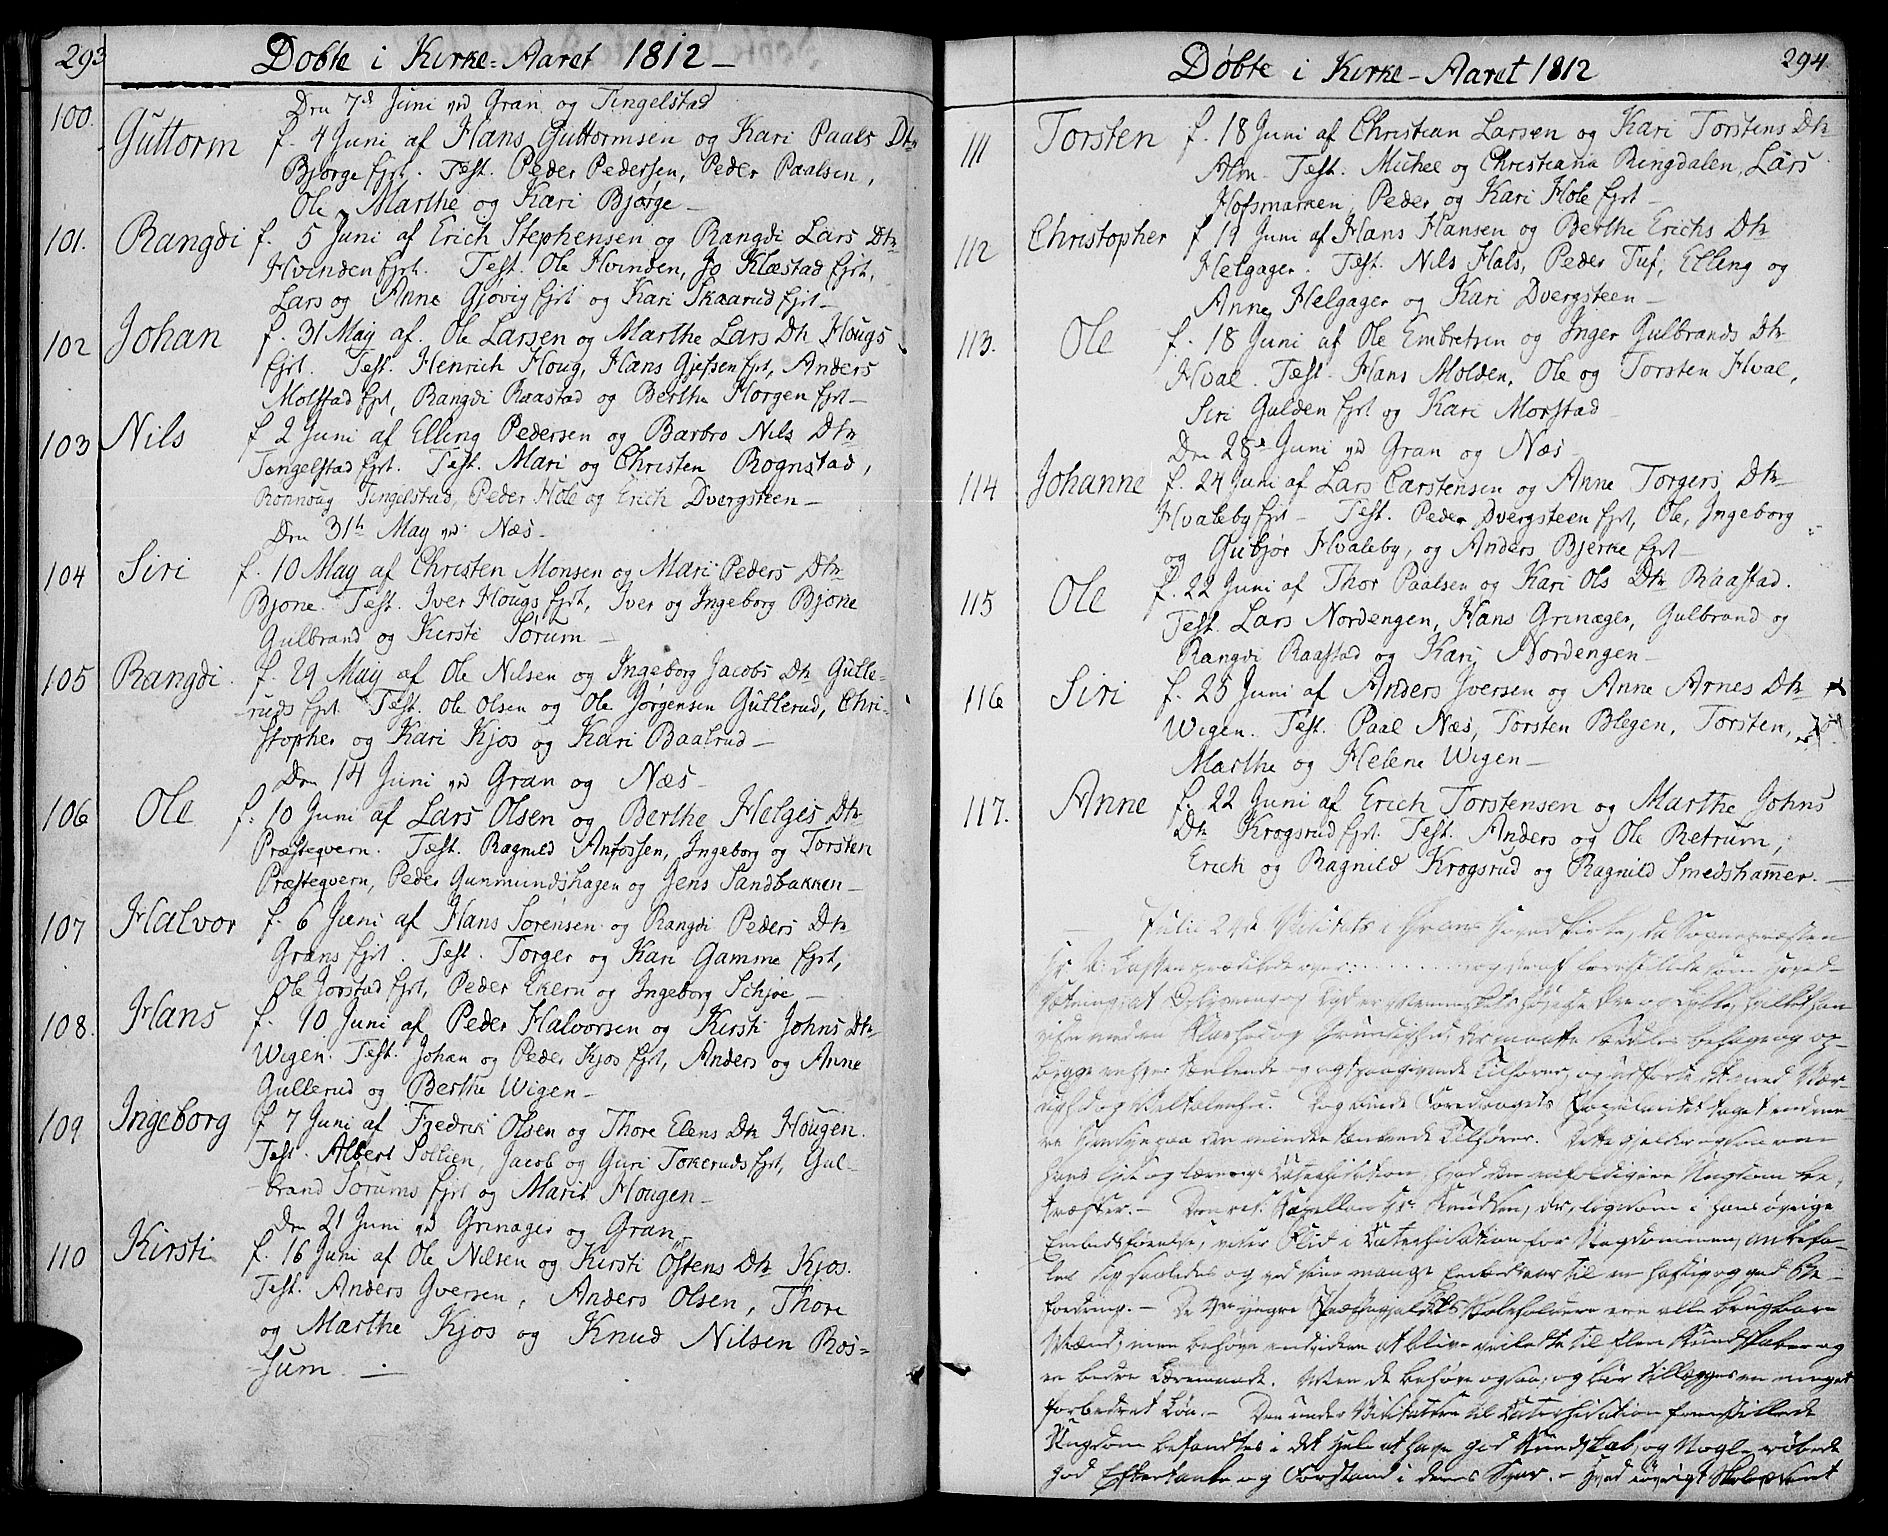 SAH, Gran prestekontor, Ministerialbok nr. 8, 1798-1811, s. 293-294